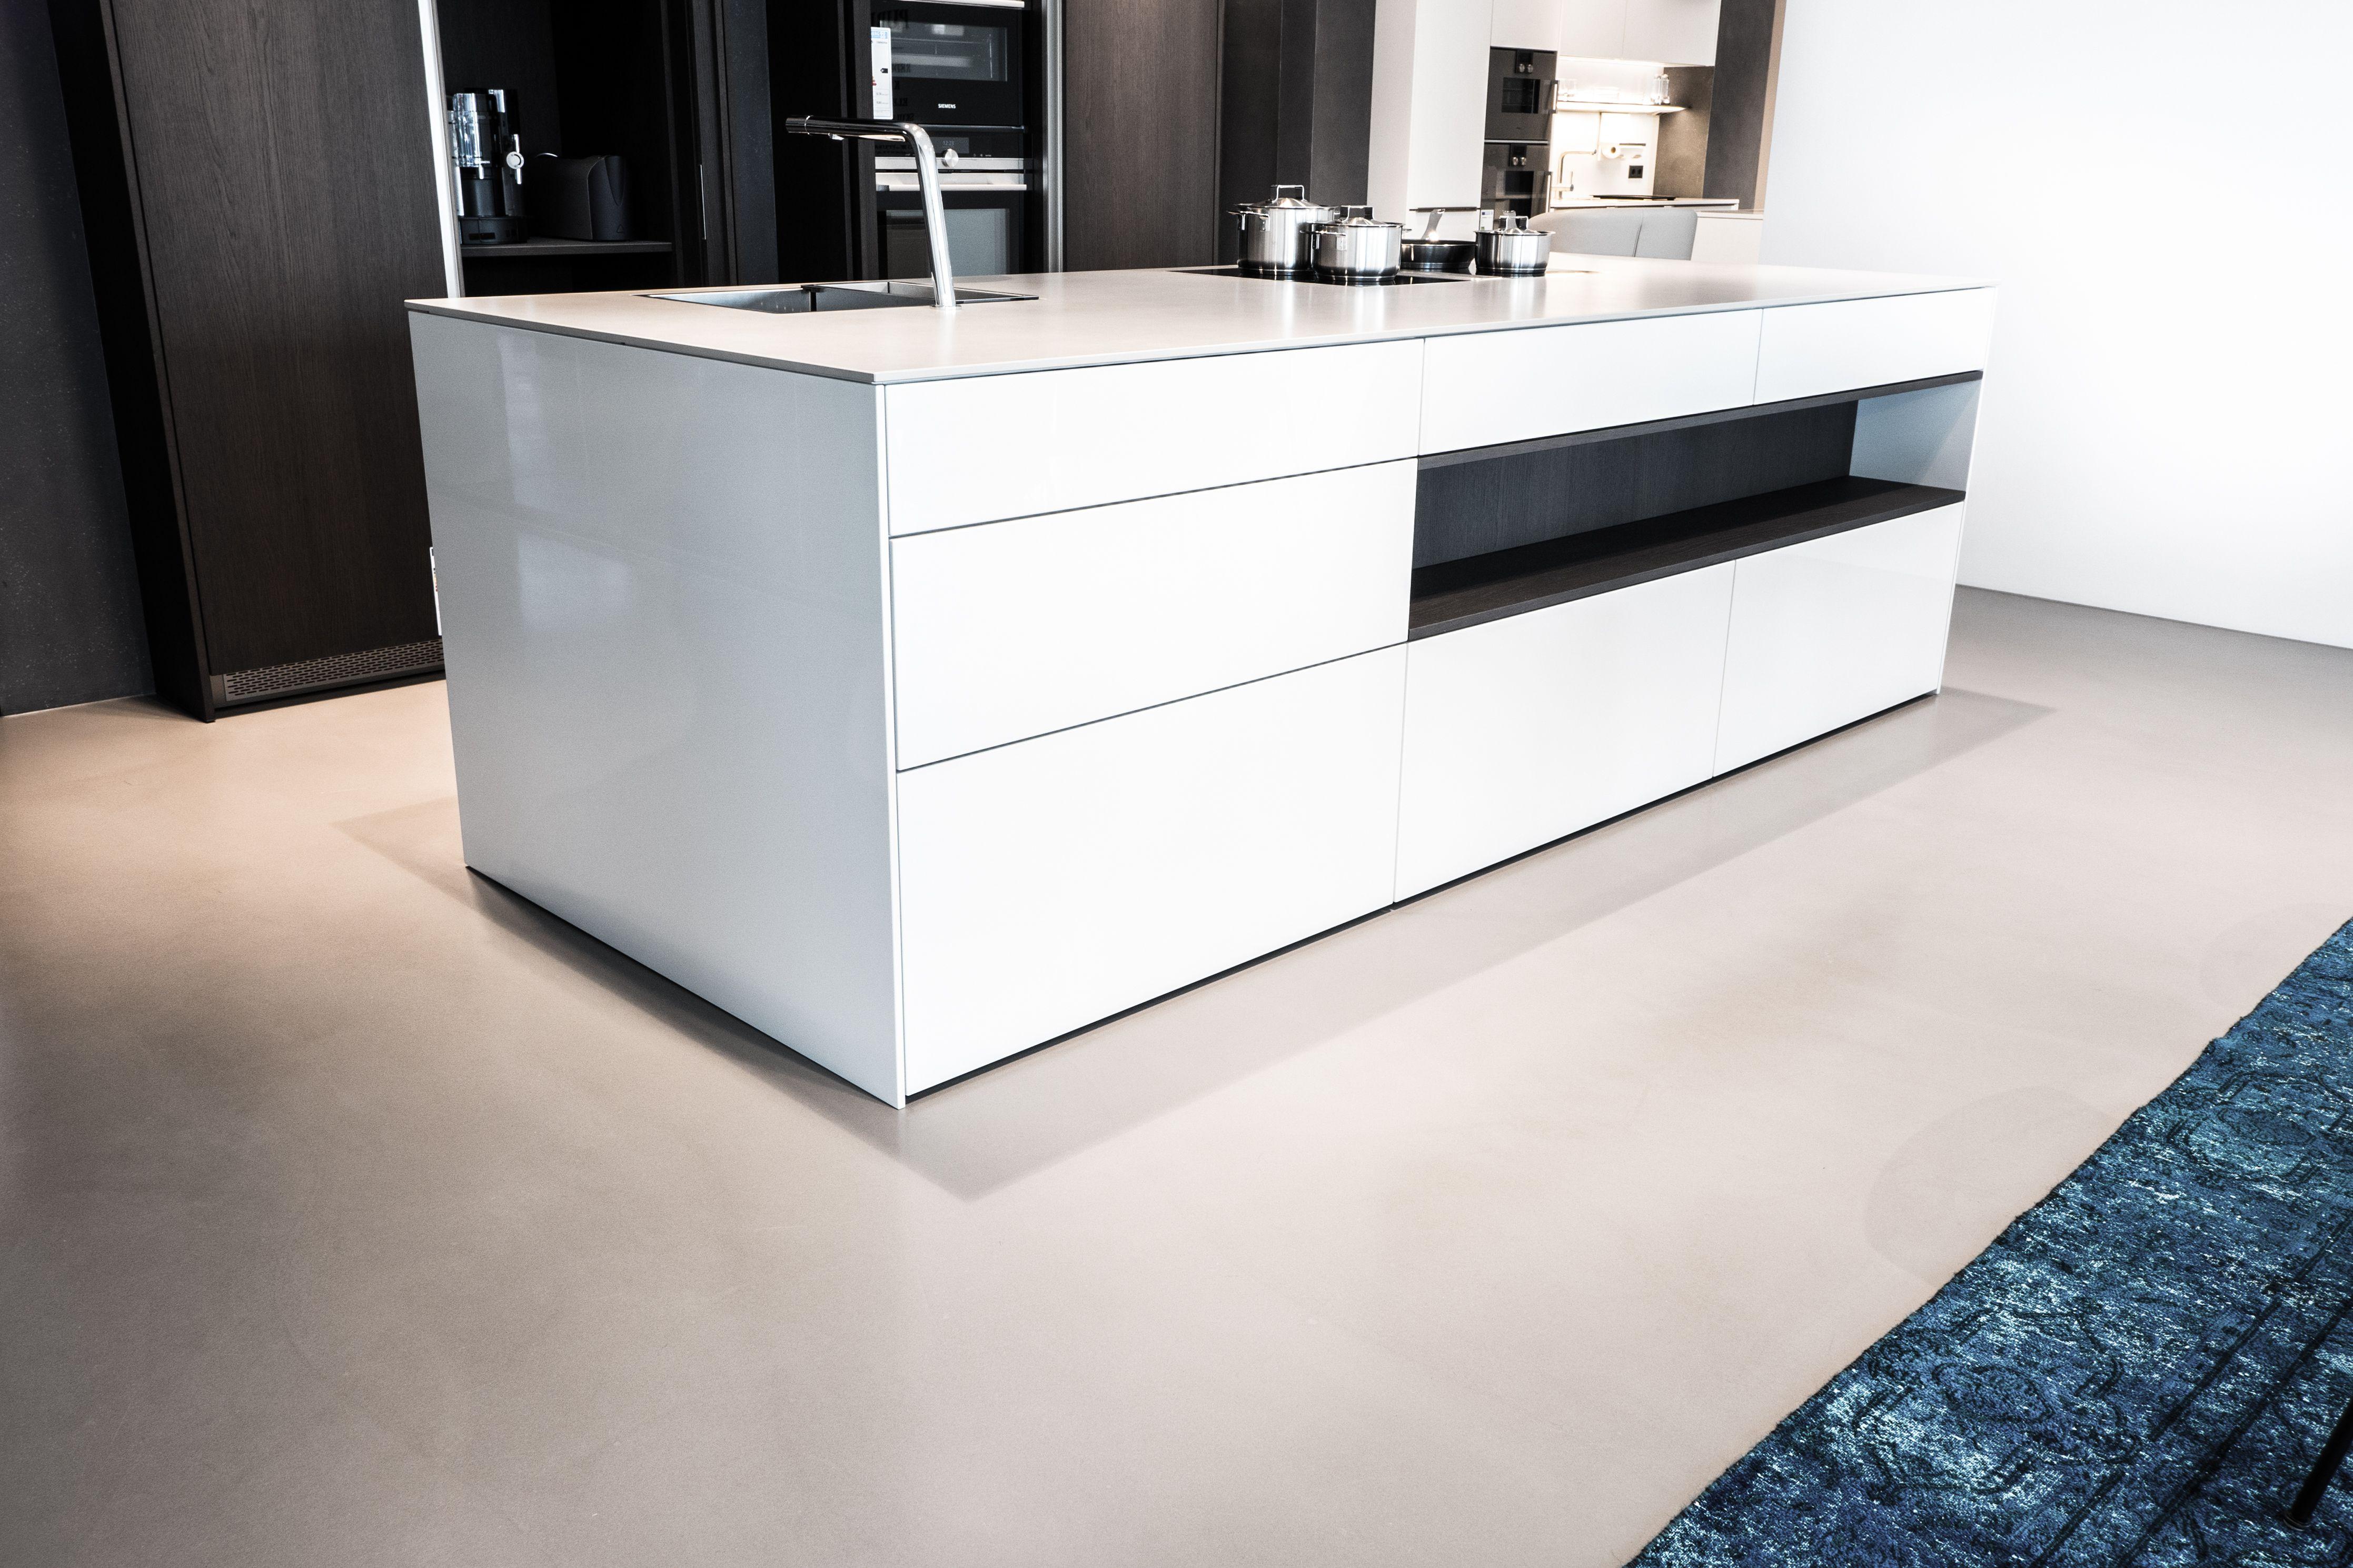 Creafloor Design Spachtel Kuche Designboden Sichtestrich Beton Kuchenboden Sichtestrich Beton Kuchenboden Kuchenboden